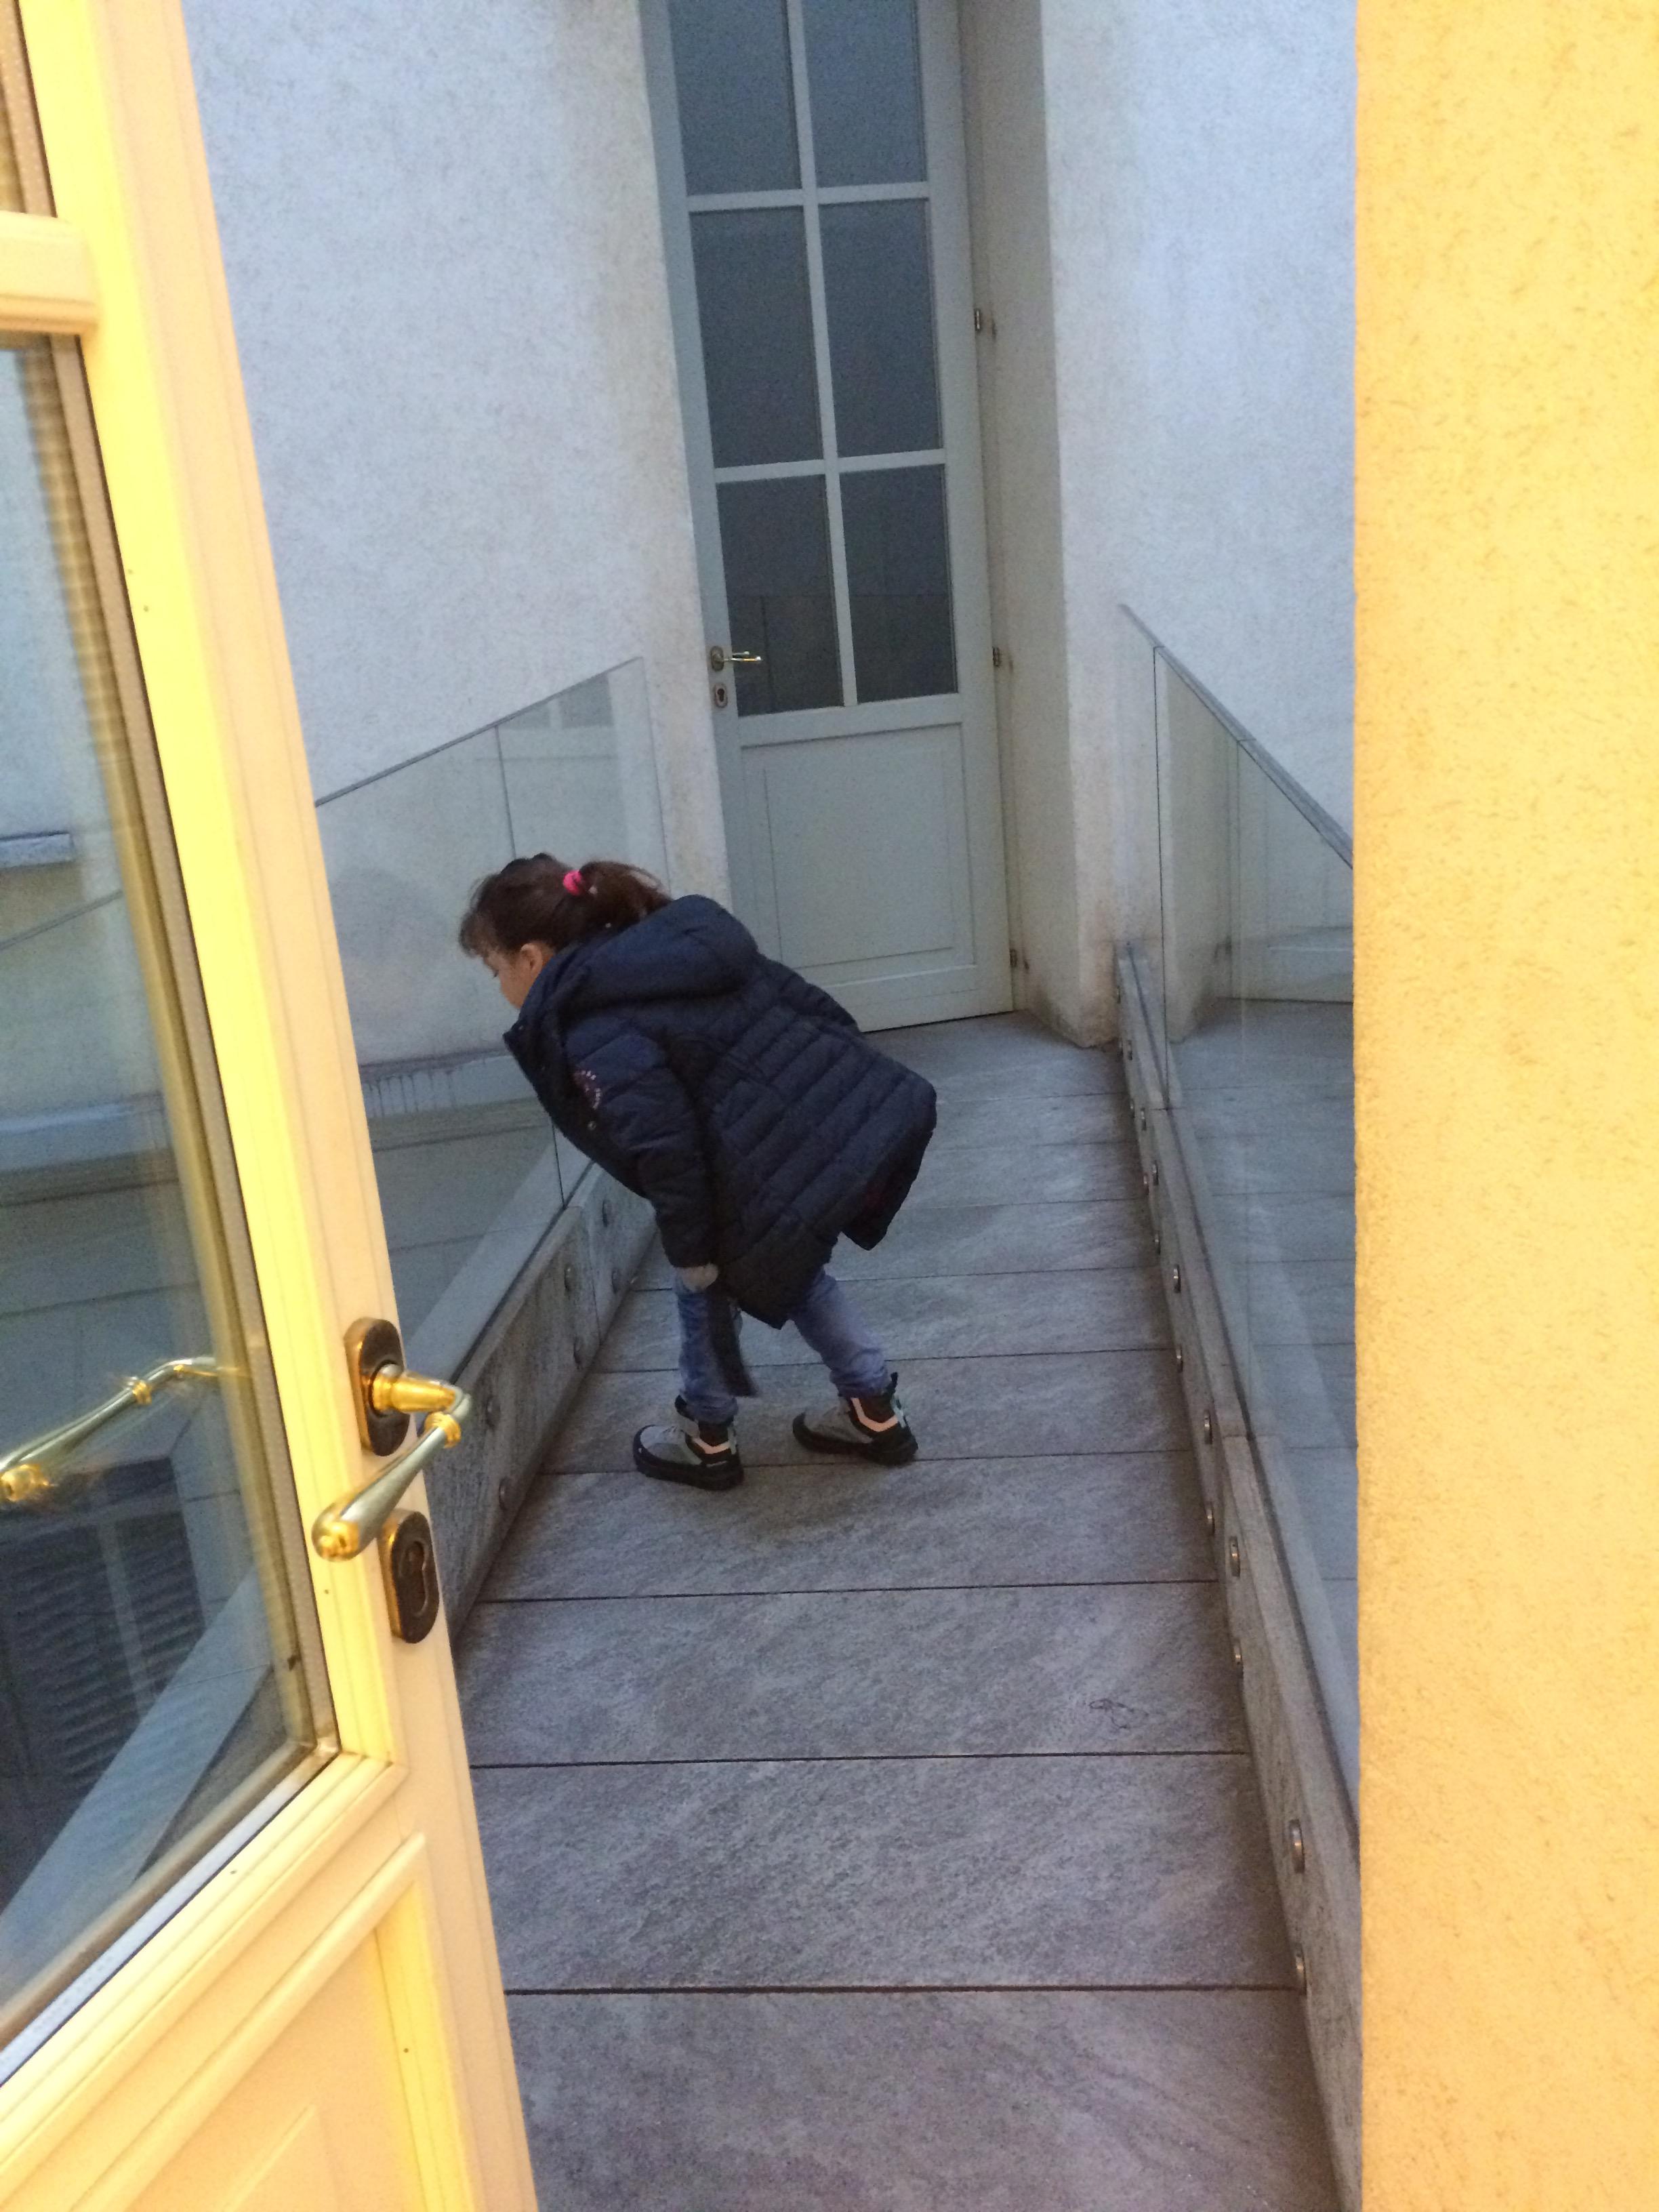 airbnbn-downtownapartment-milan.JPG